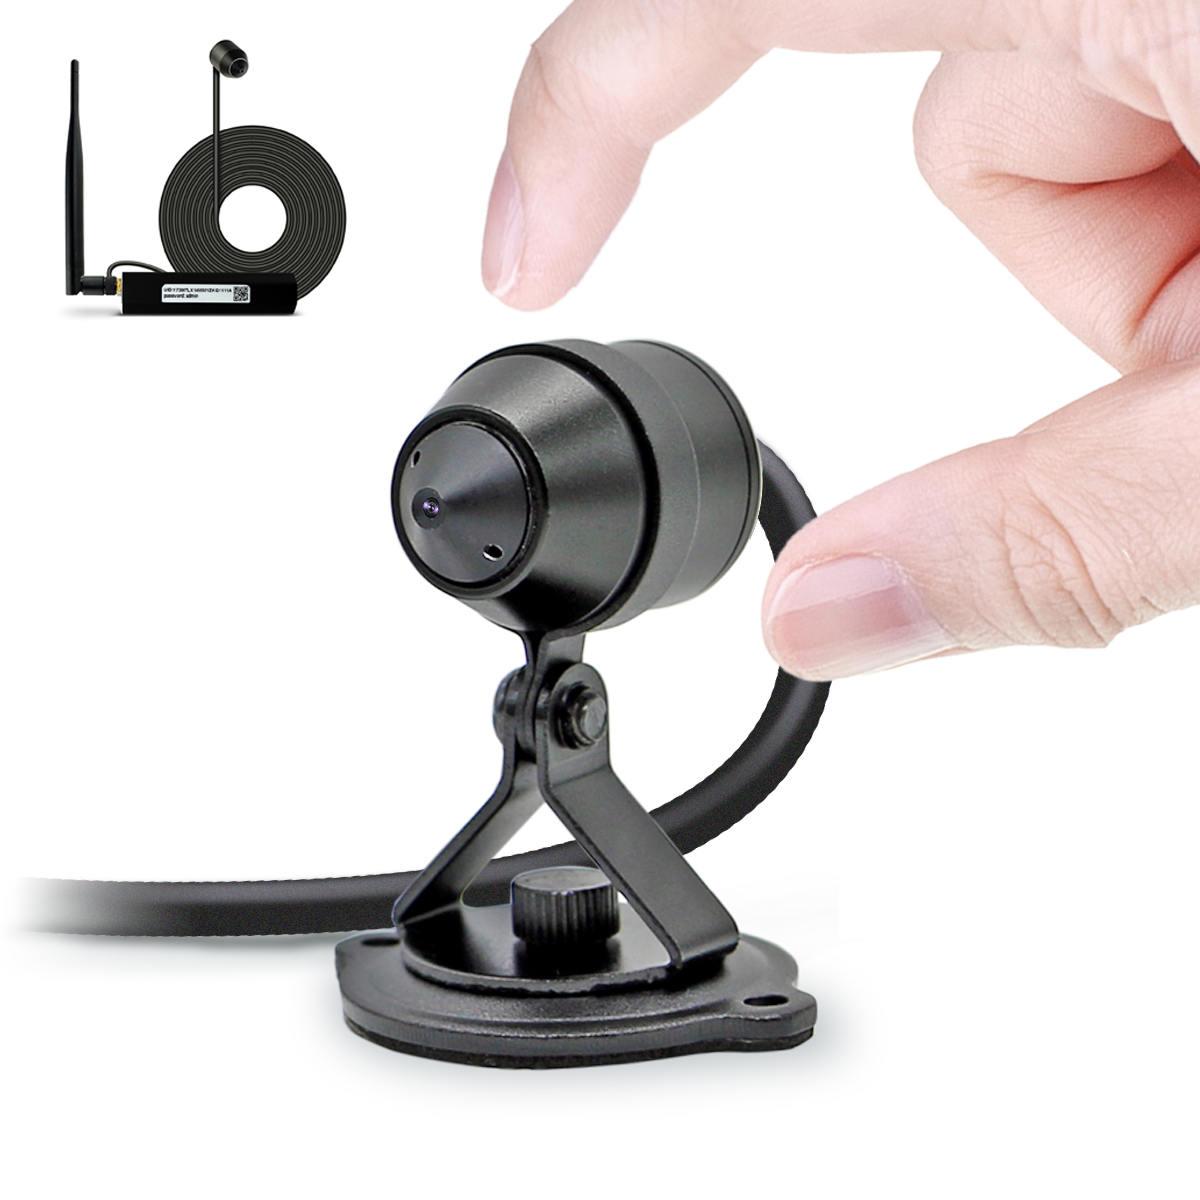 Mini Wireless HD Security Camera, Tiny Lens, Waterproof (TT521PW)